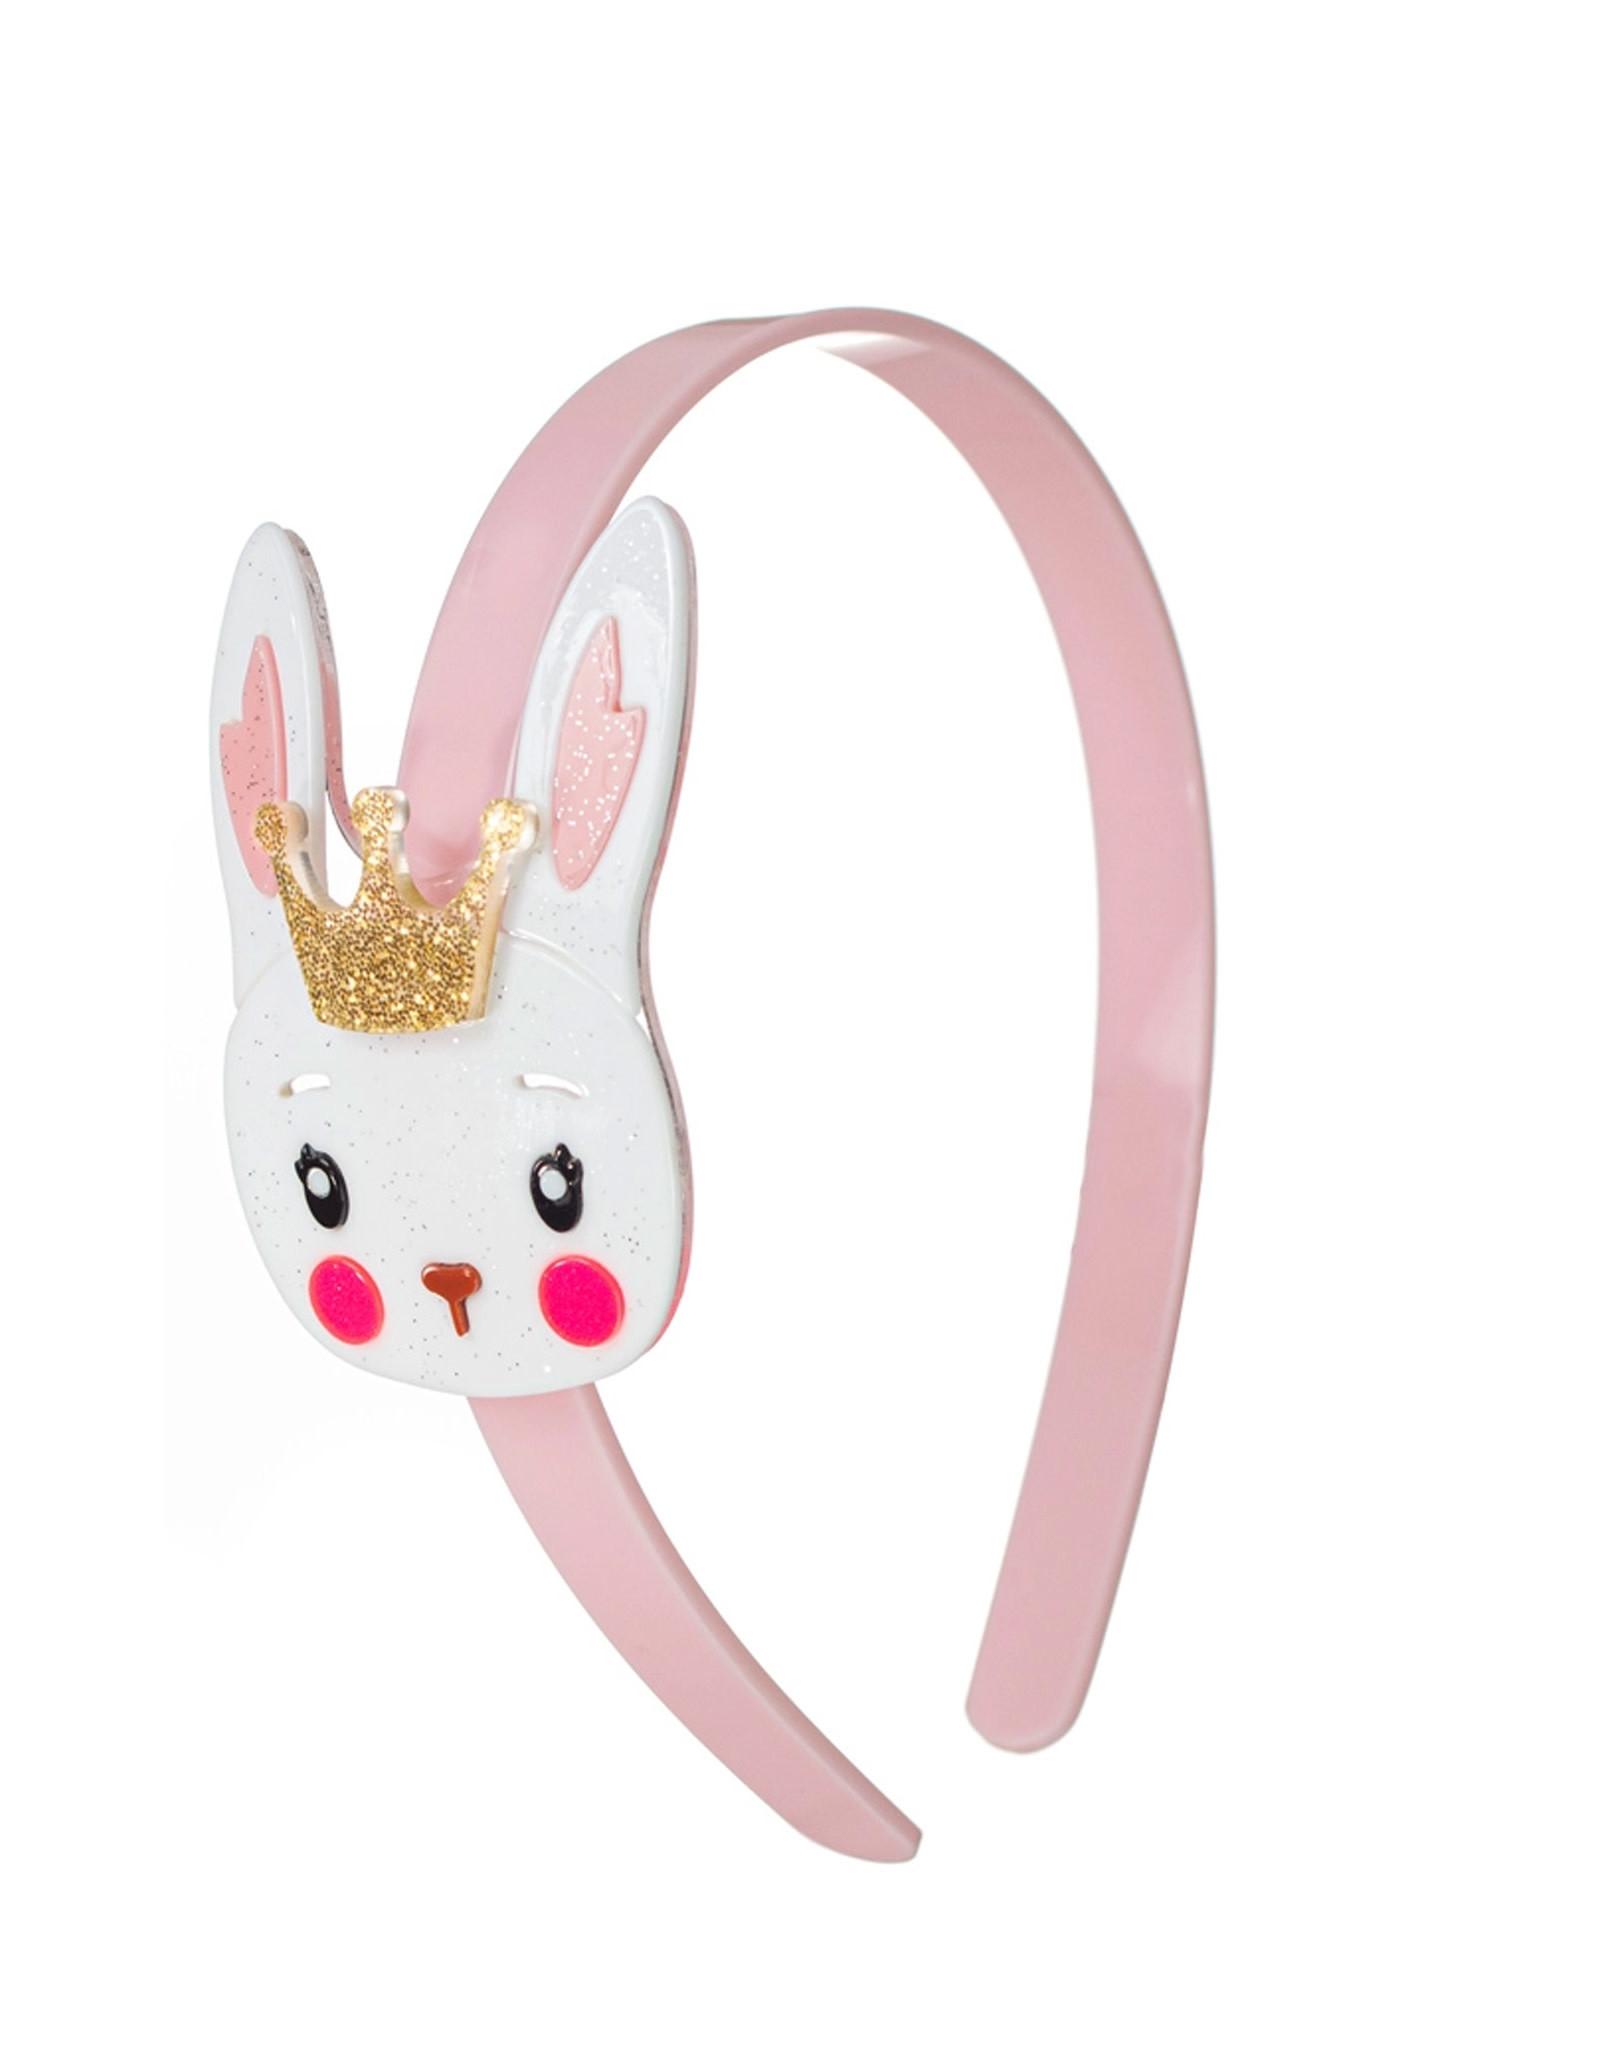 Lillies & Roses White Bunny w/ Crown Headband